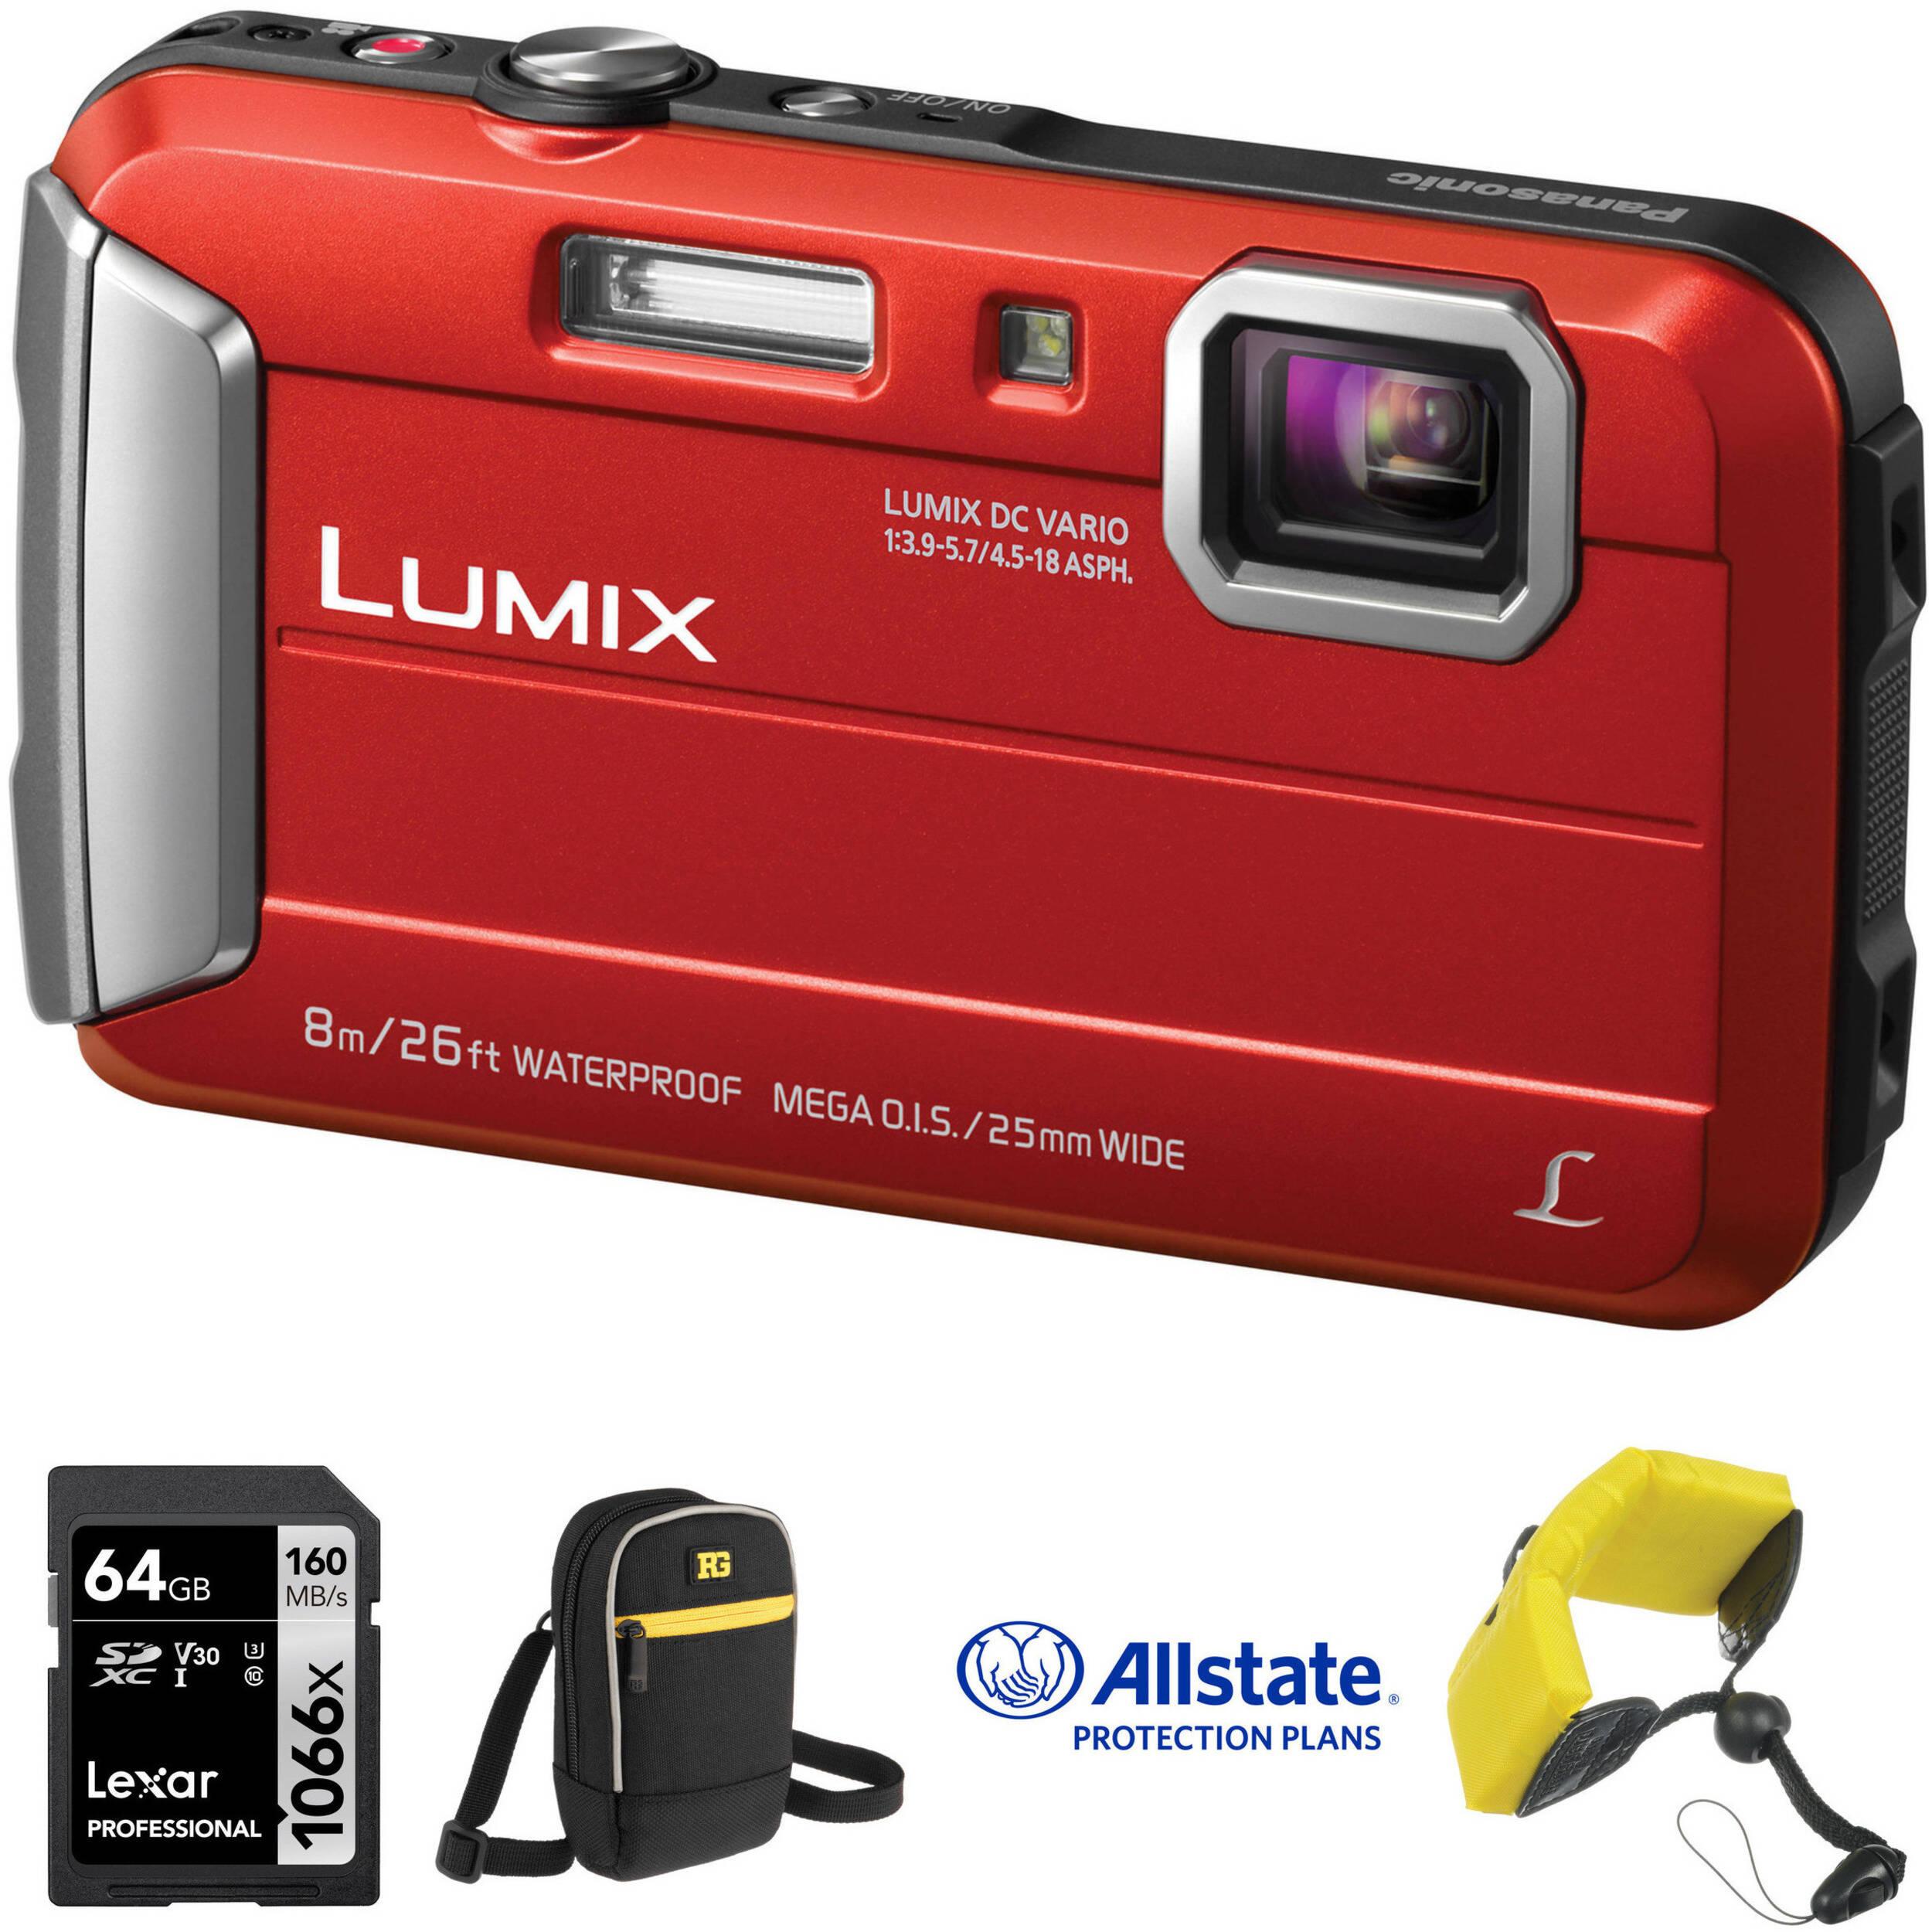 2 Pack SDHC Panasonic Lumix DMC-TS30 Digital Camera Memory Card 2 x 32GB Secure Digital High Capacity Memory Cards